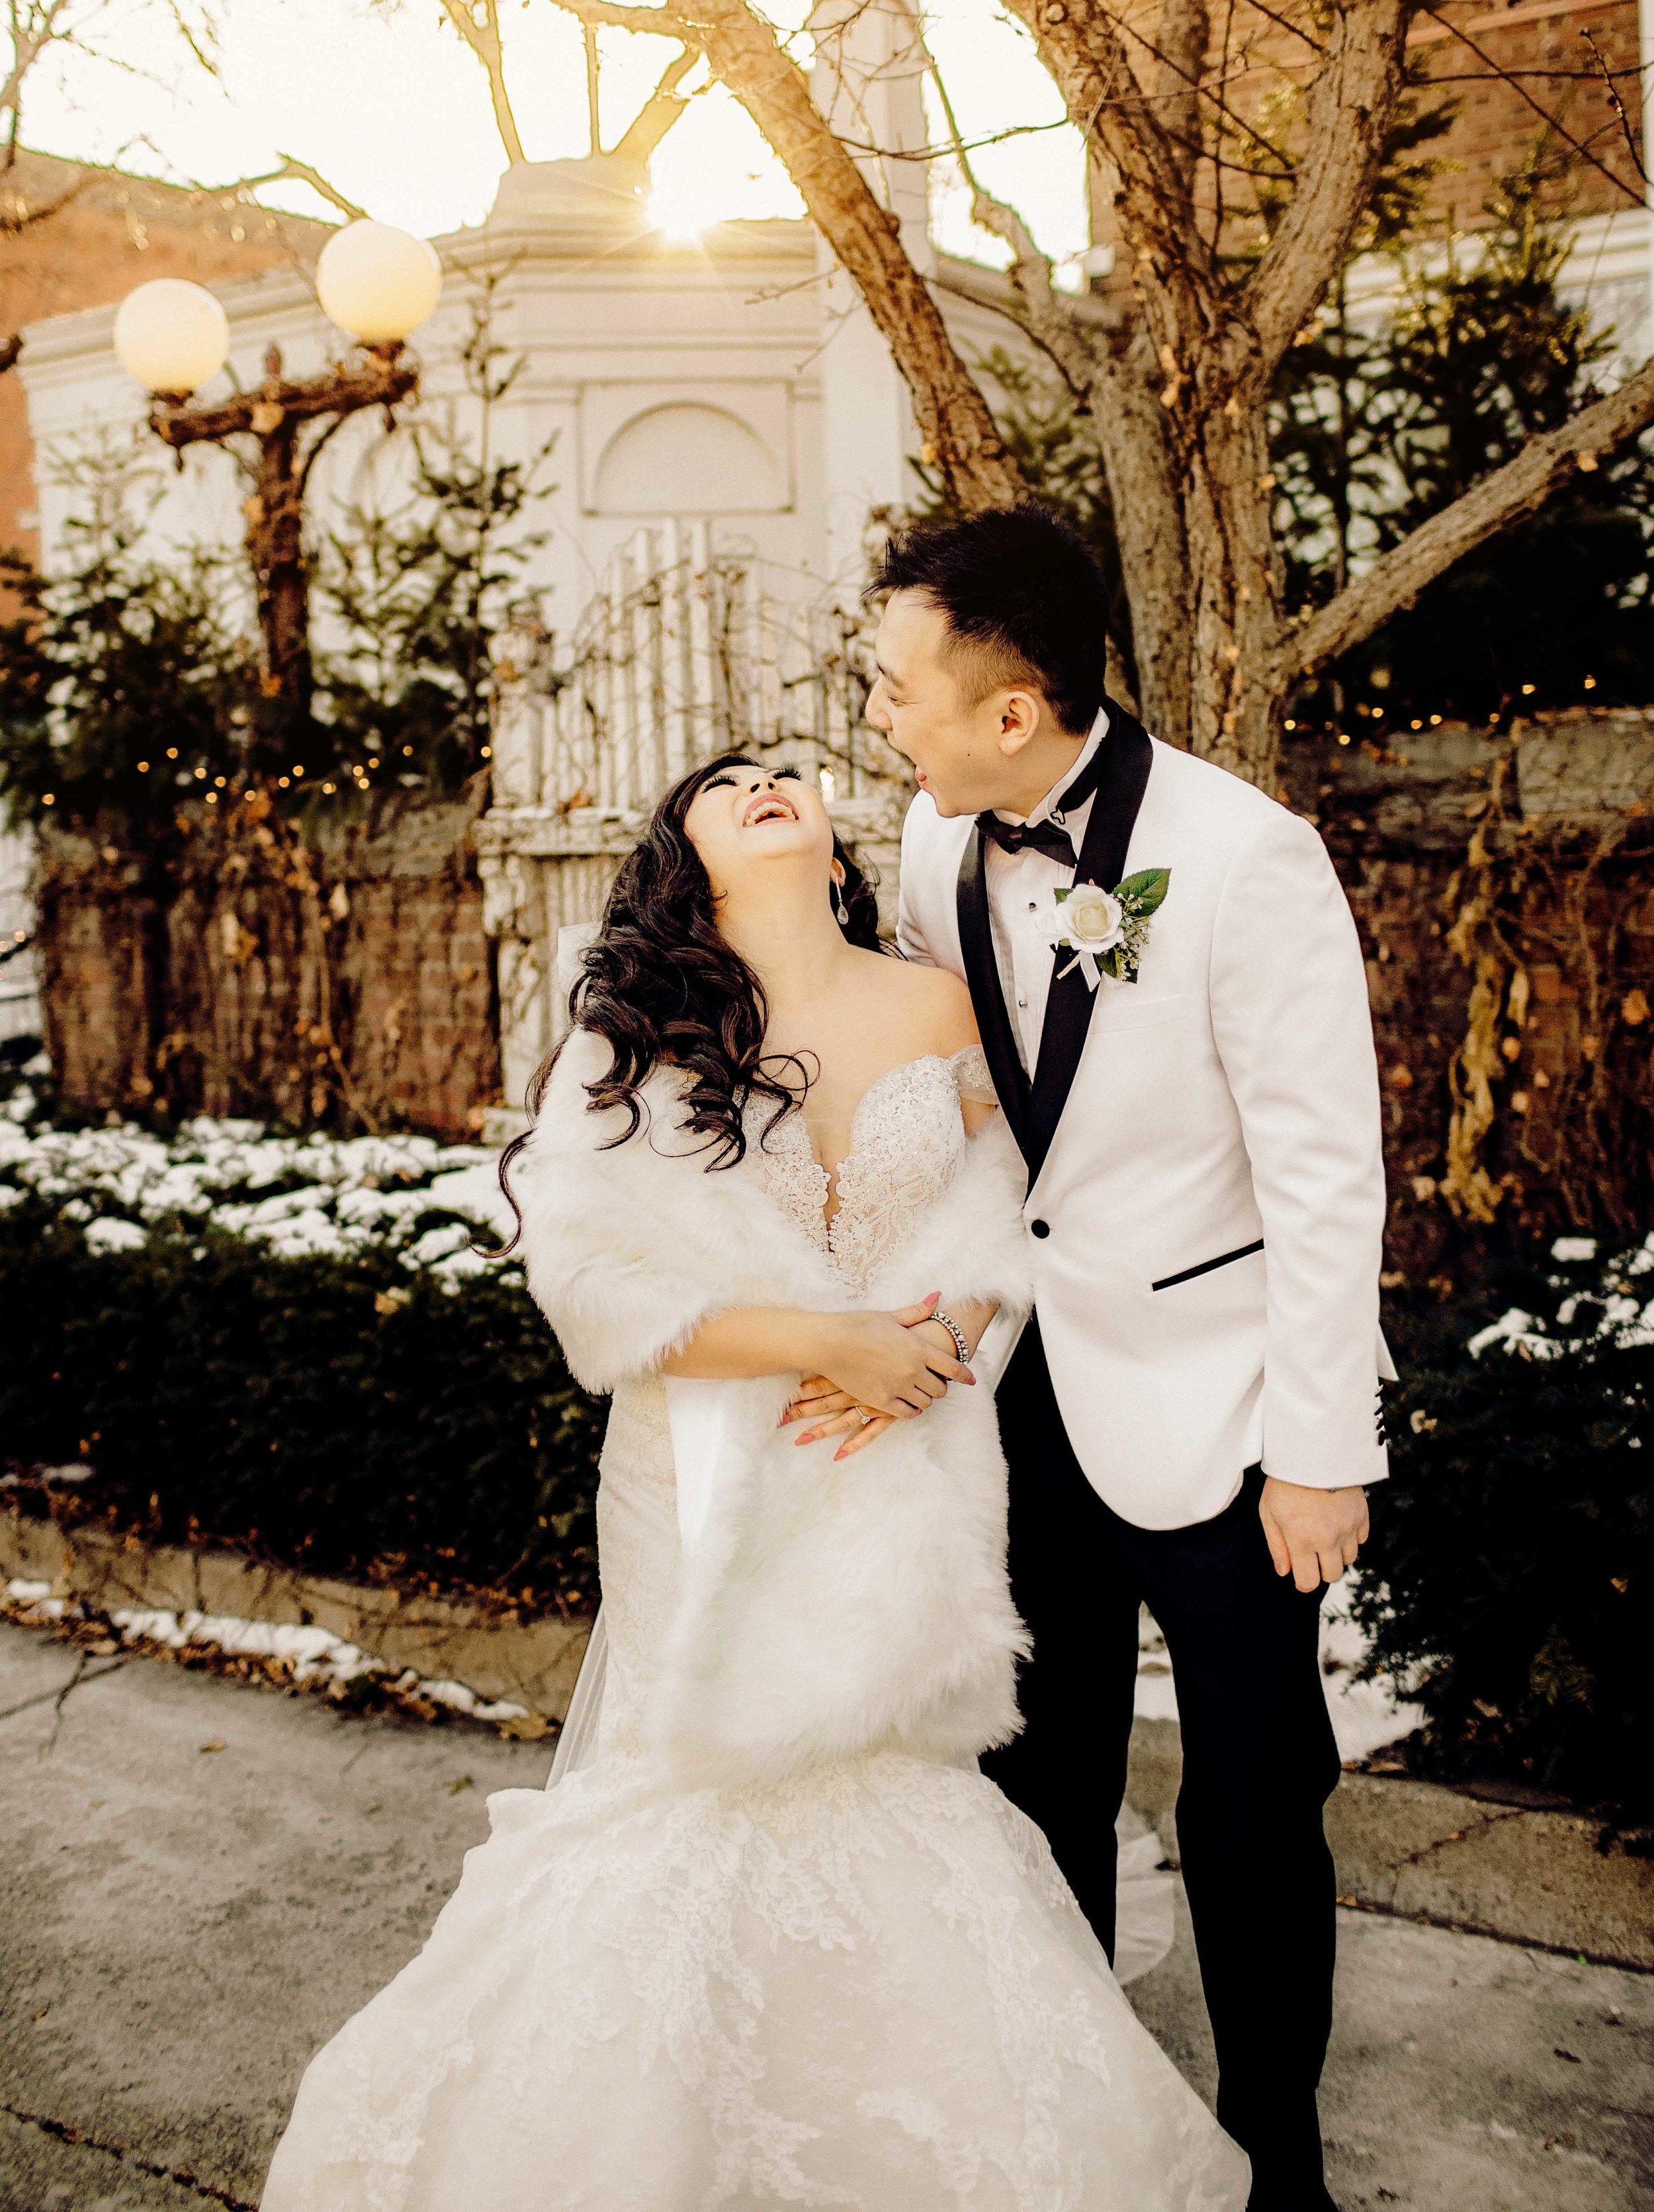 Honey + Yao, Part II, The Bride and Groom-71.jpg